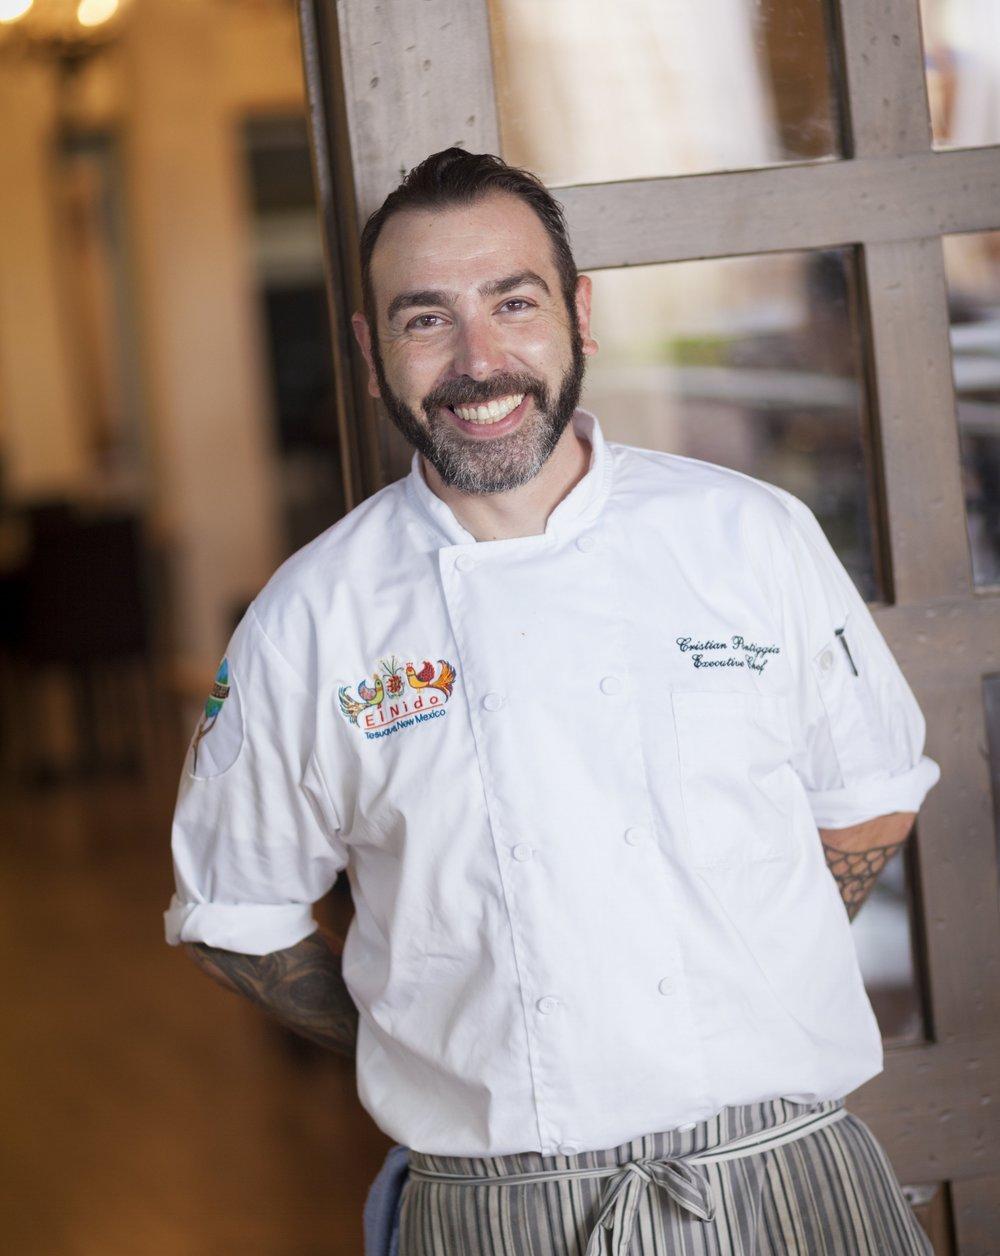 Chef Cristian Pontiggia of El Nido